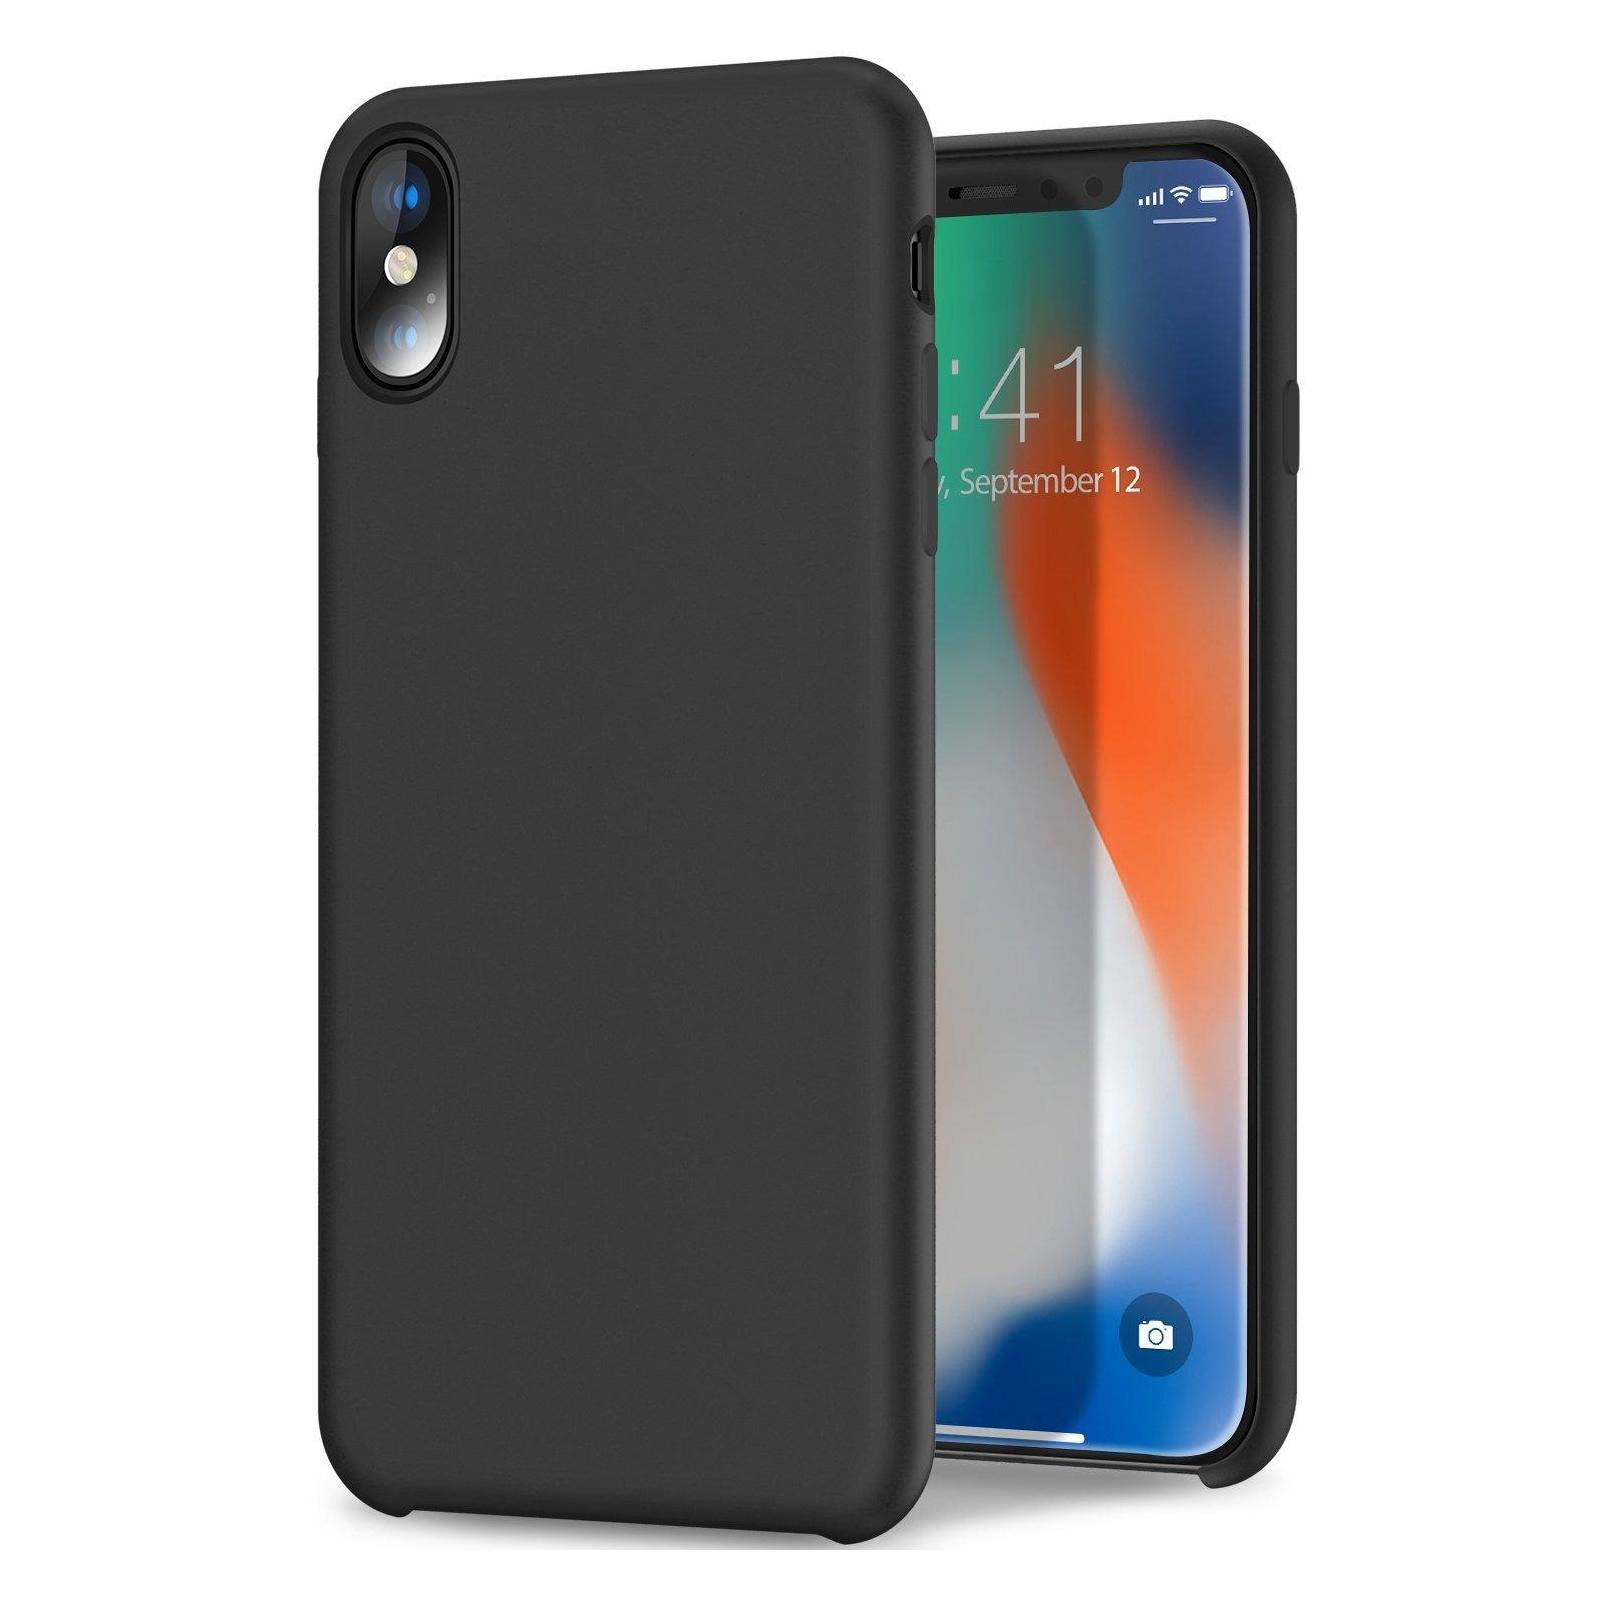 Чехол для моб. телефона Laudtec для iPhone X/XS liquid case (black) (LT-IXLC)